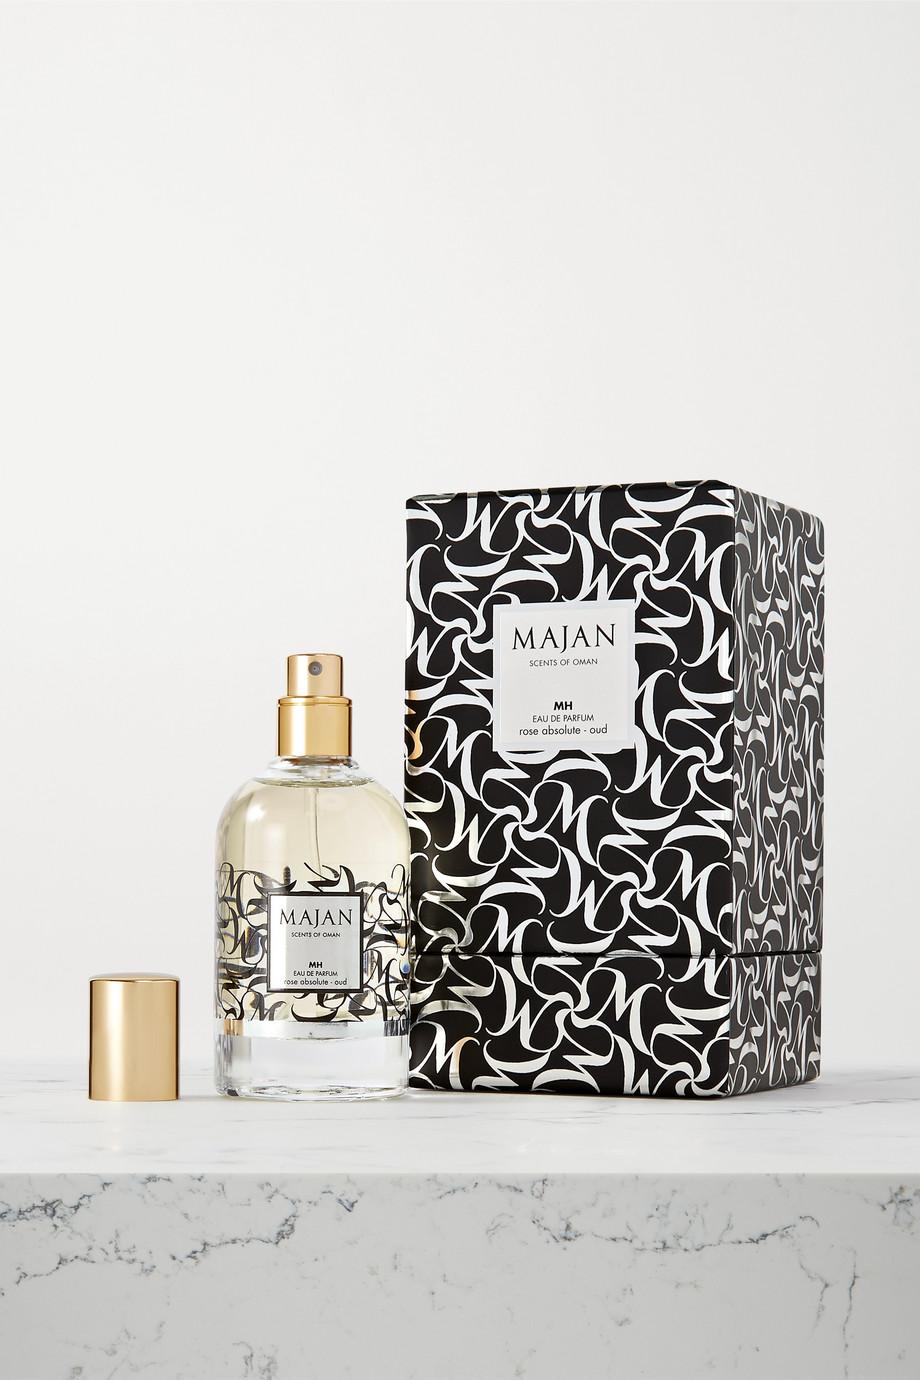 MAJAN MH, 50 ml – Eau de Parfum